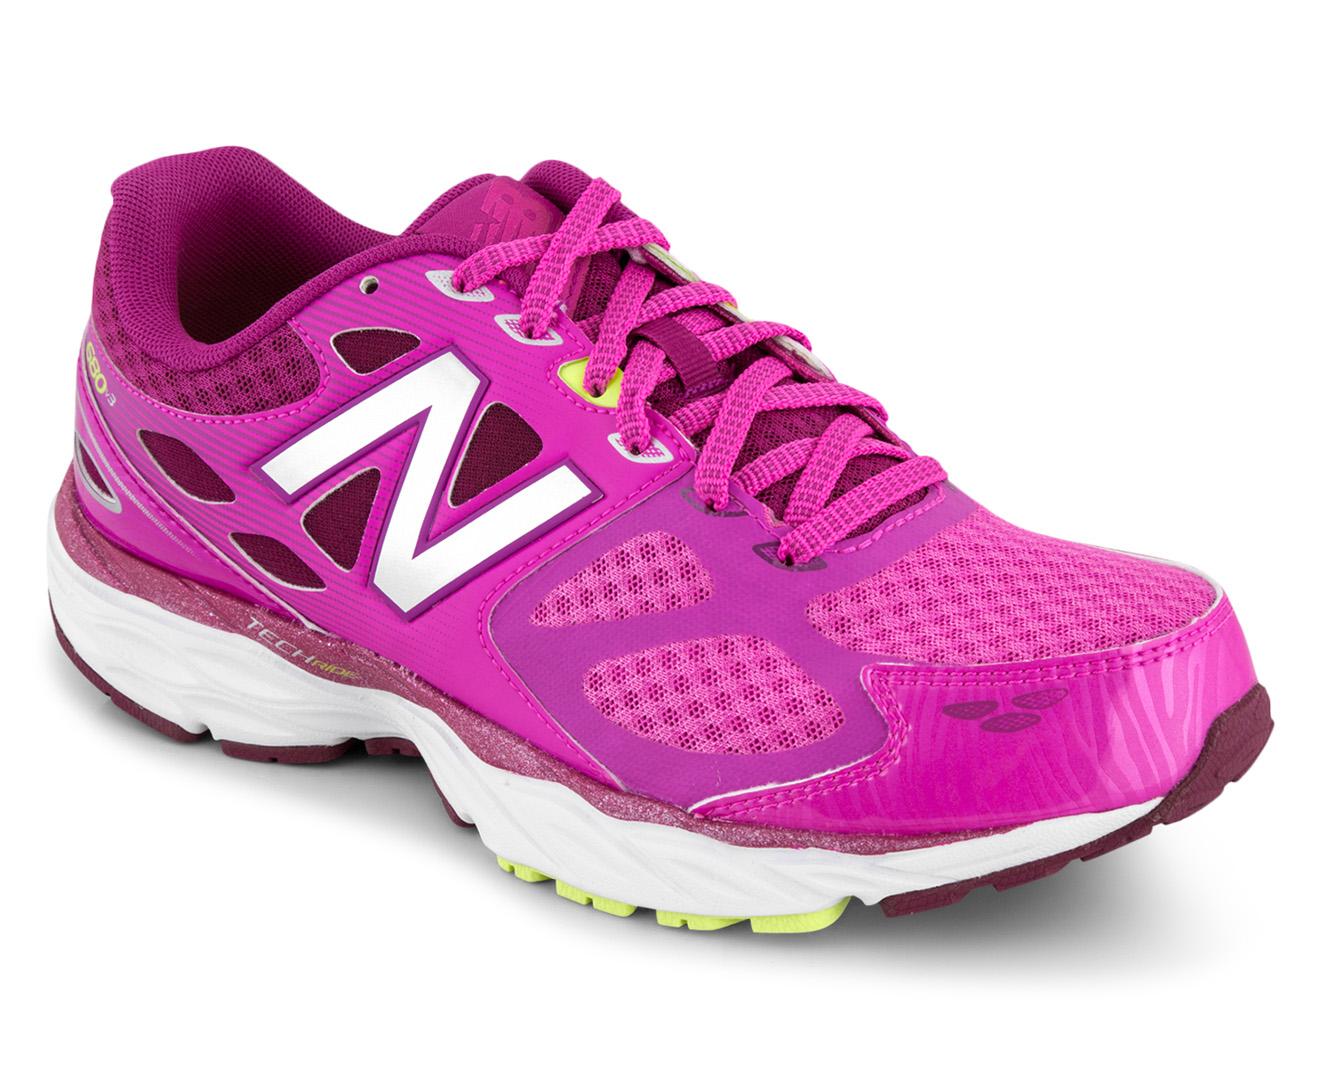 New Balance Men S V Comfort Ride Running Shoe